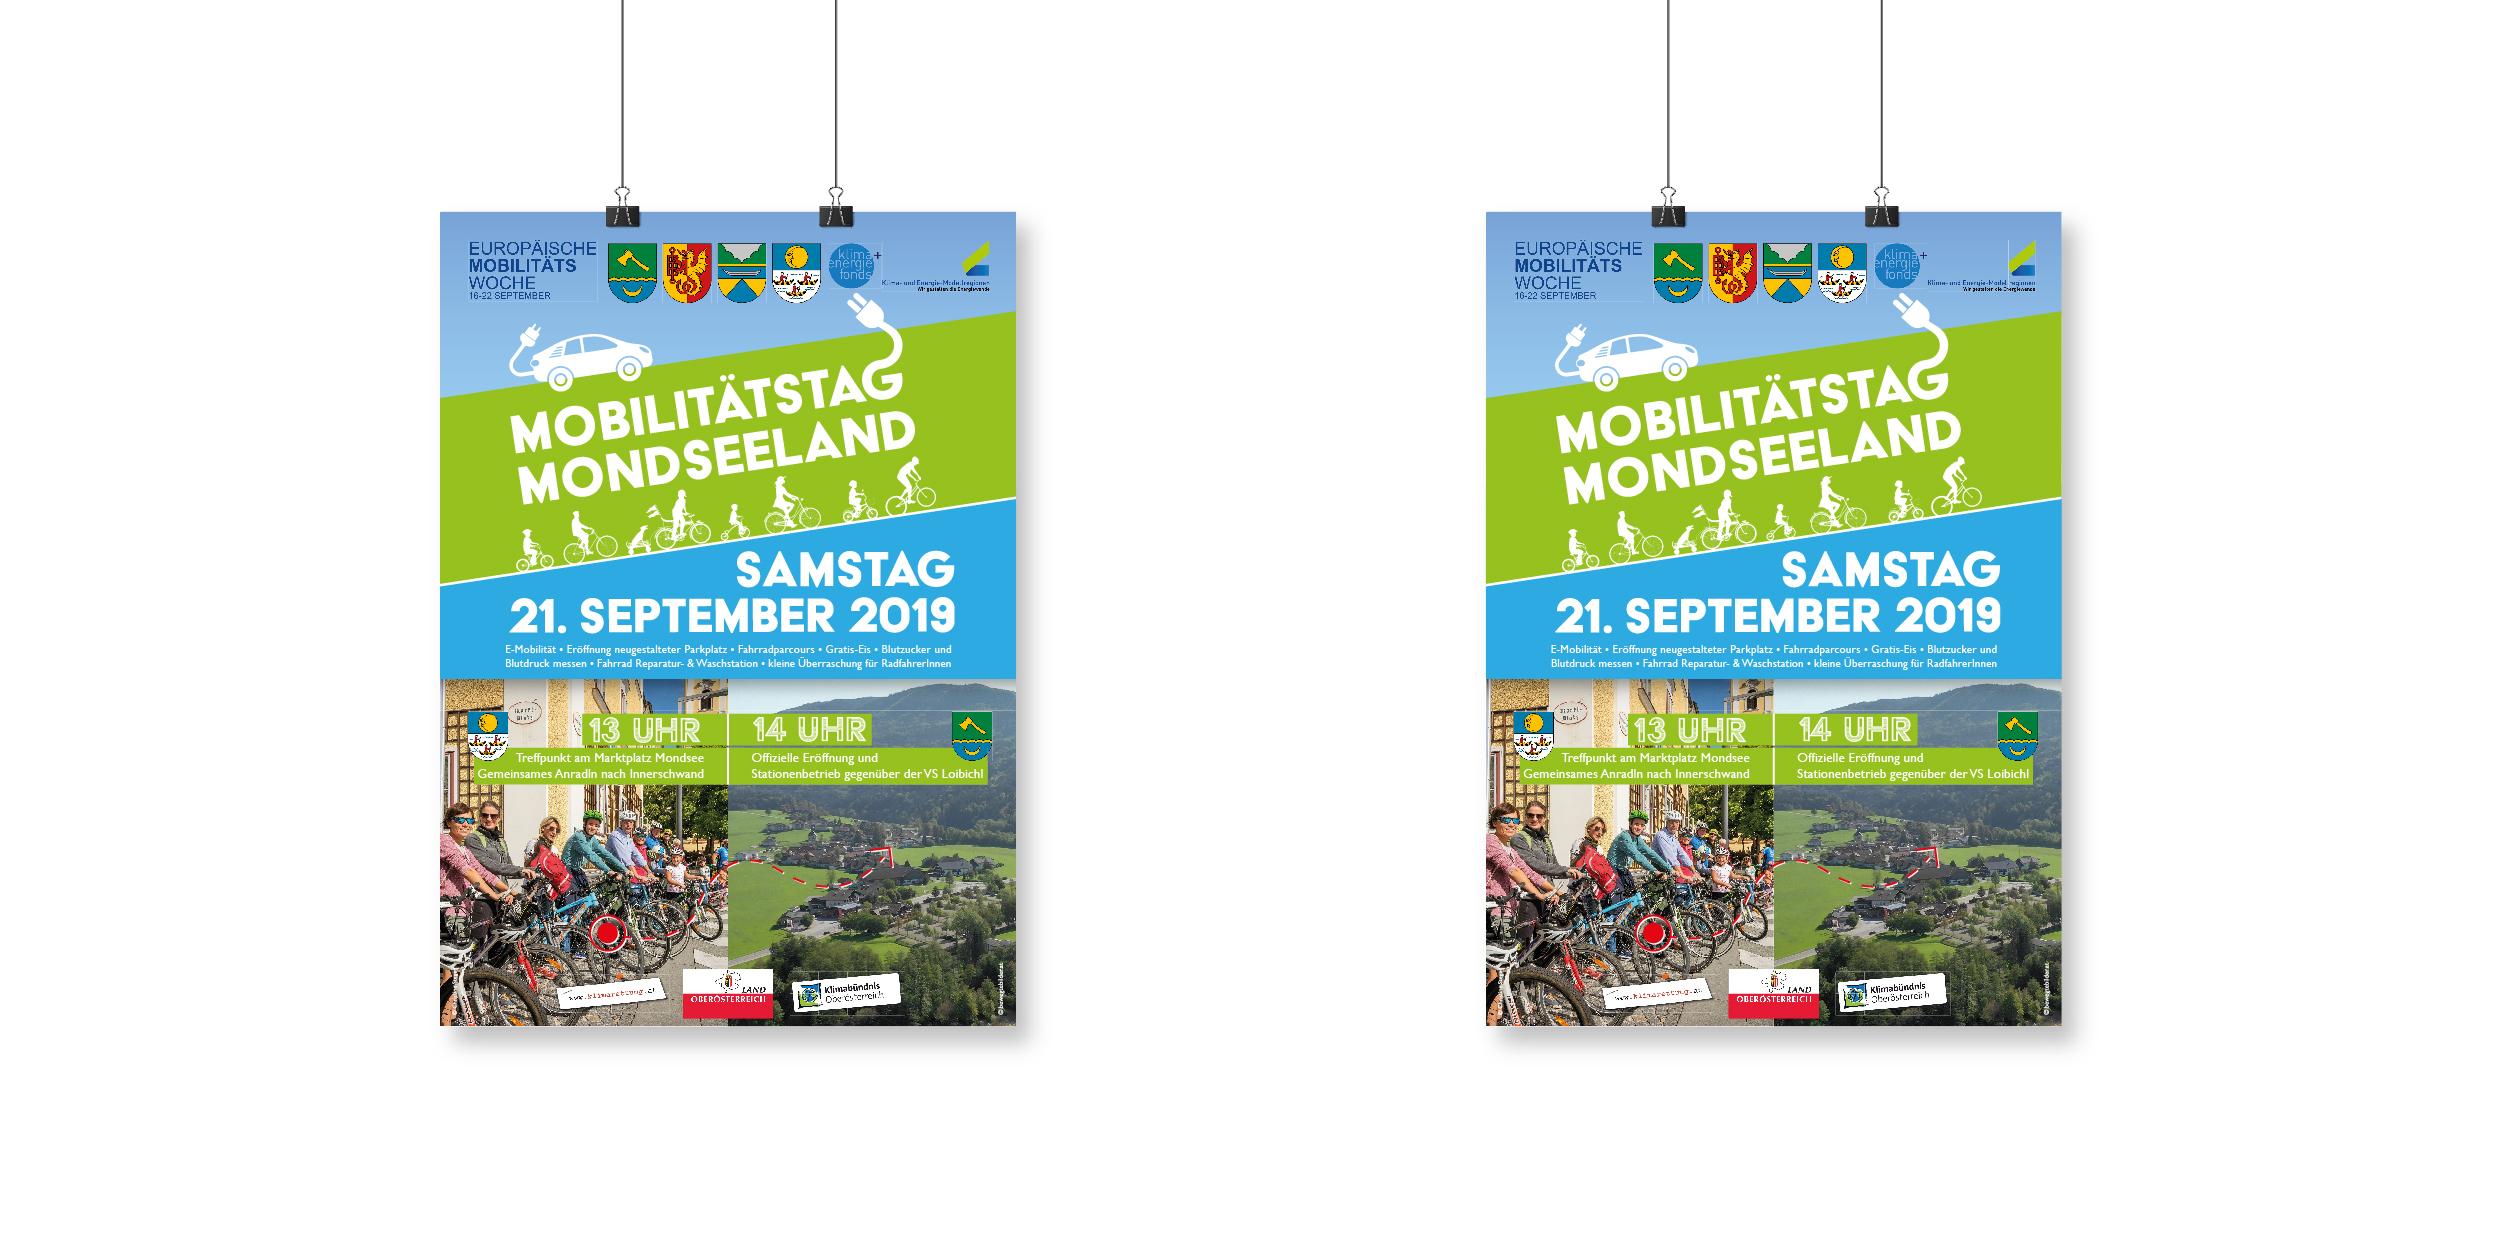 dsignery_Mobilitätstag_Mondseeland_Plakat-08